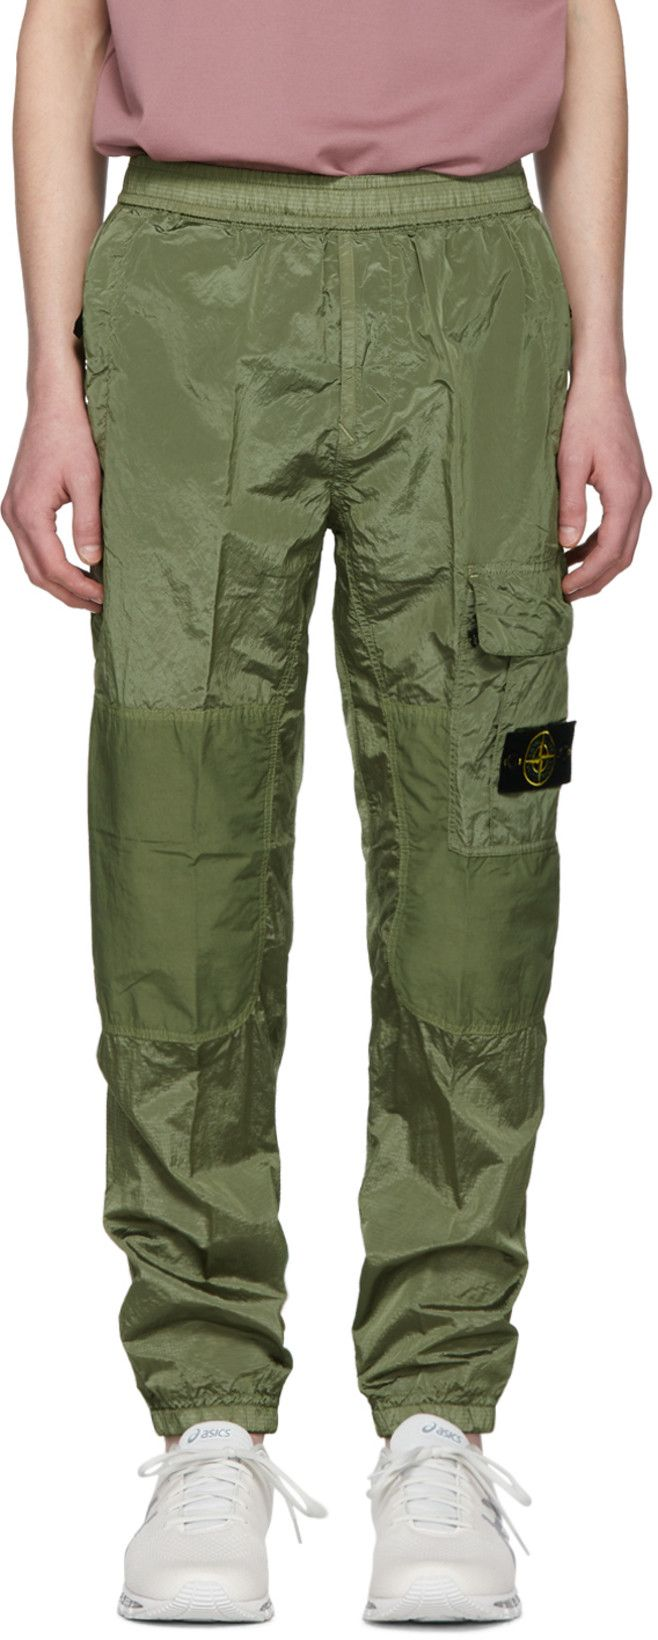 Stone Island Green Ripstop Cargo Pants Stone Island Clothing Luxury Streetwear Stone Island